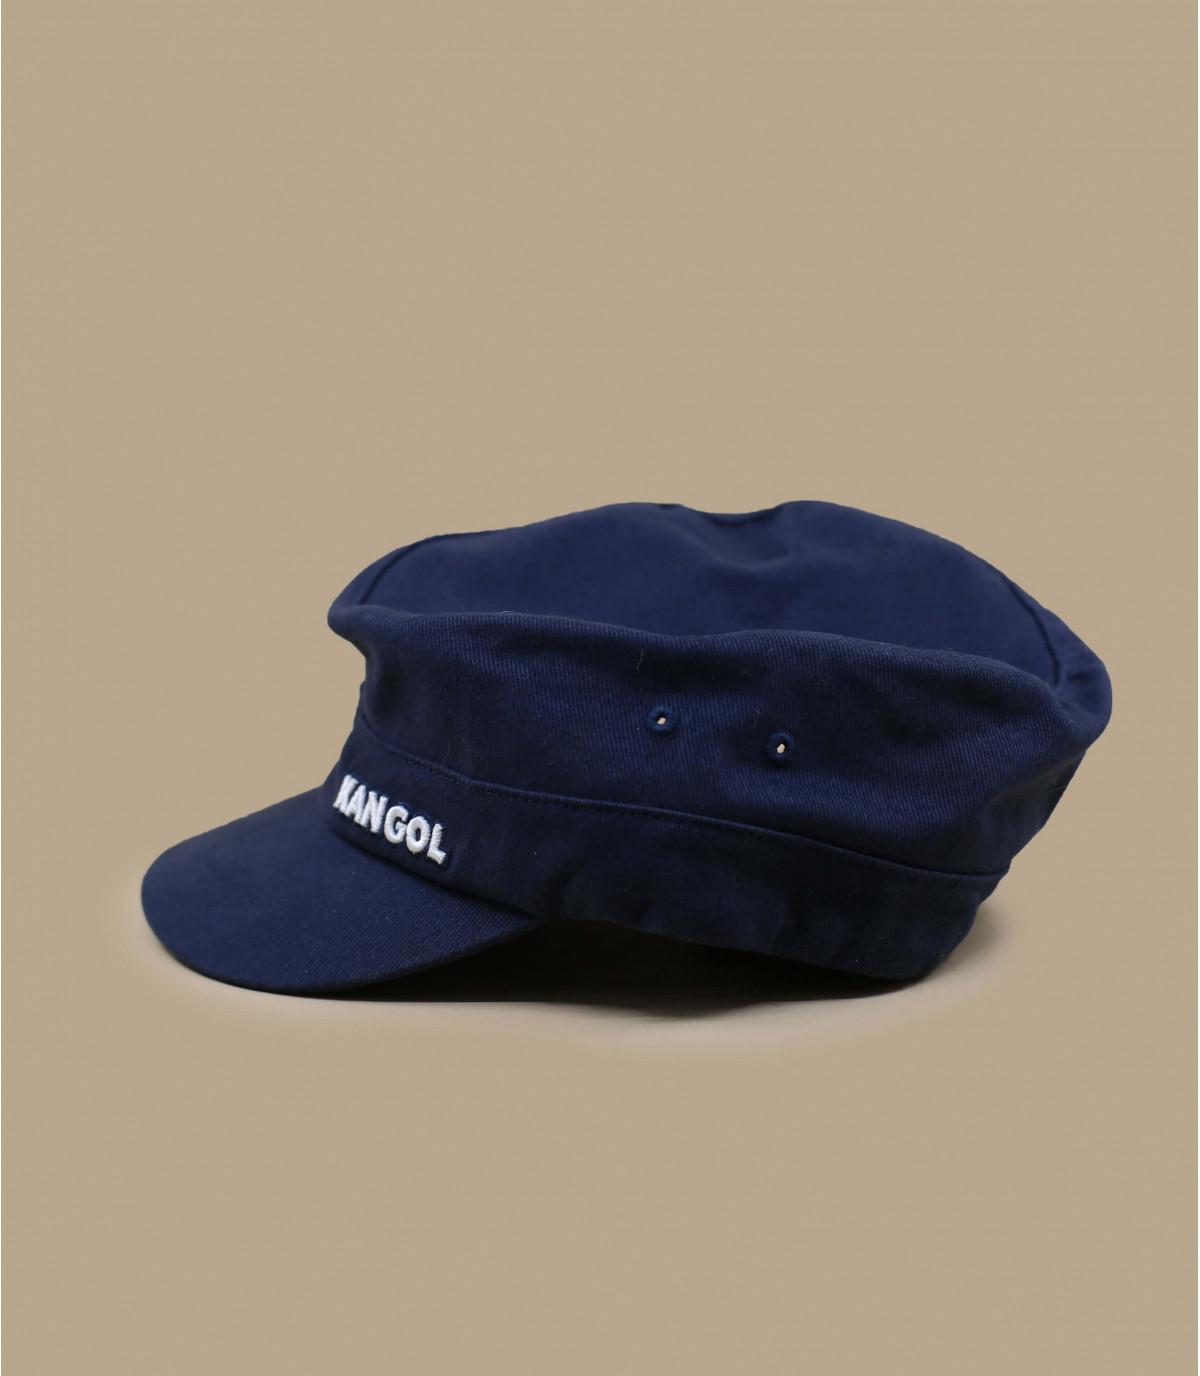 Kangol blue army cap